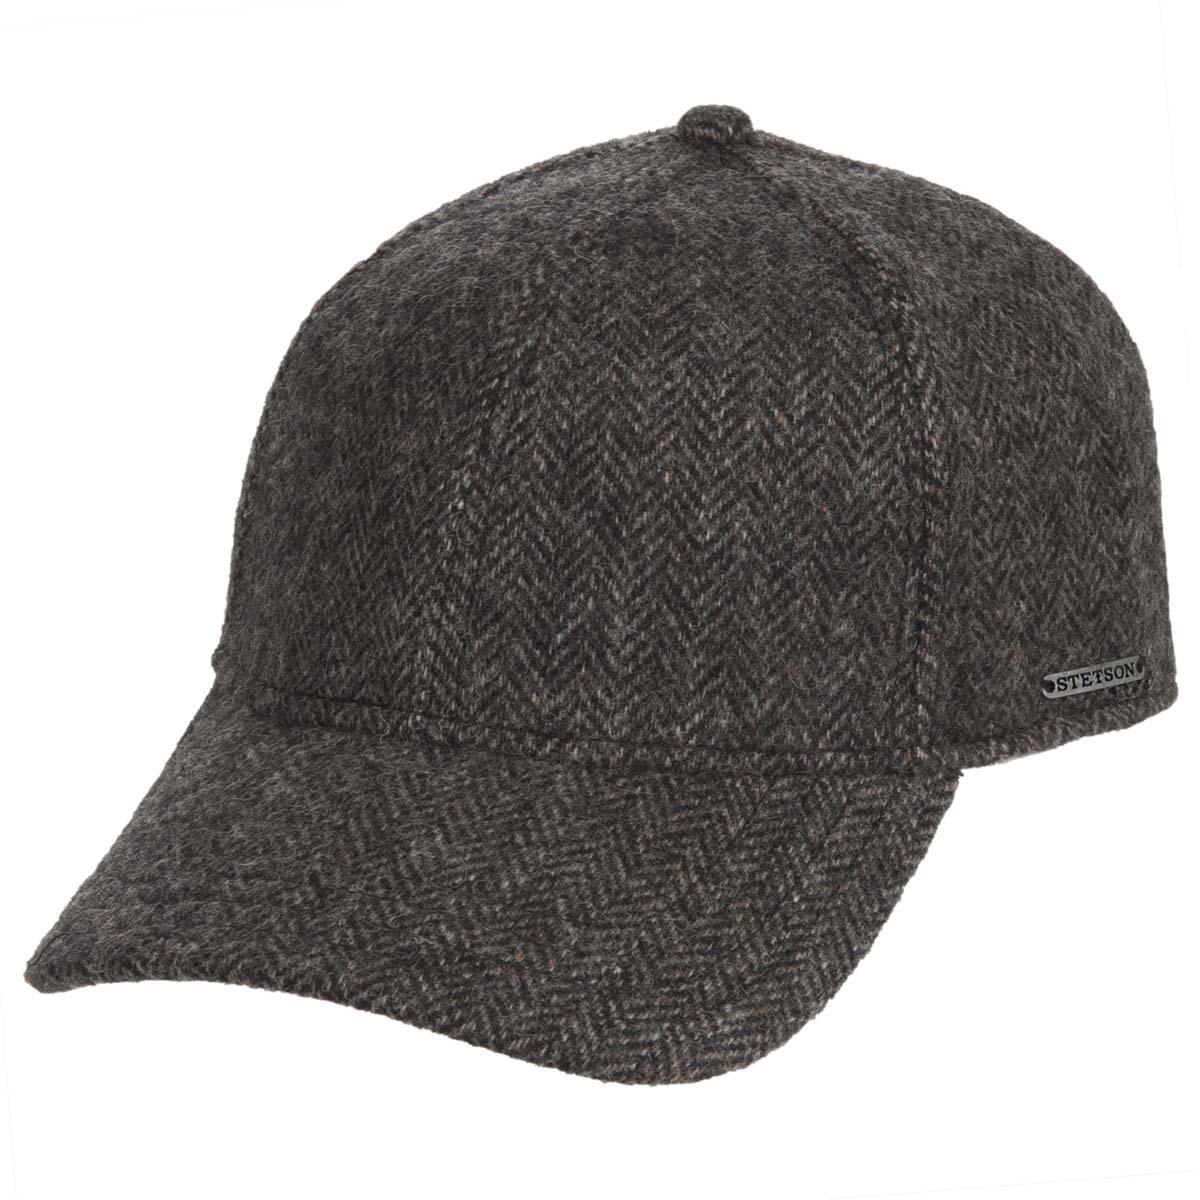 e0049cd049c0e Baseball cap Plano Woolrich style by Stetson